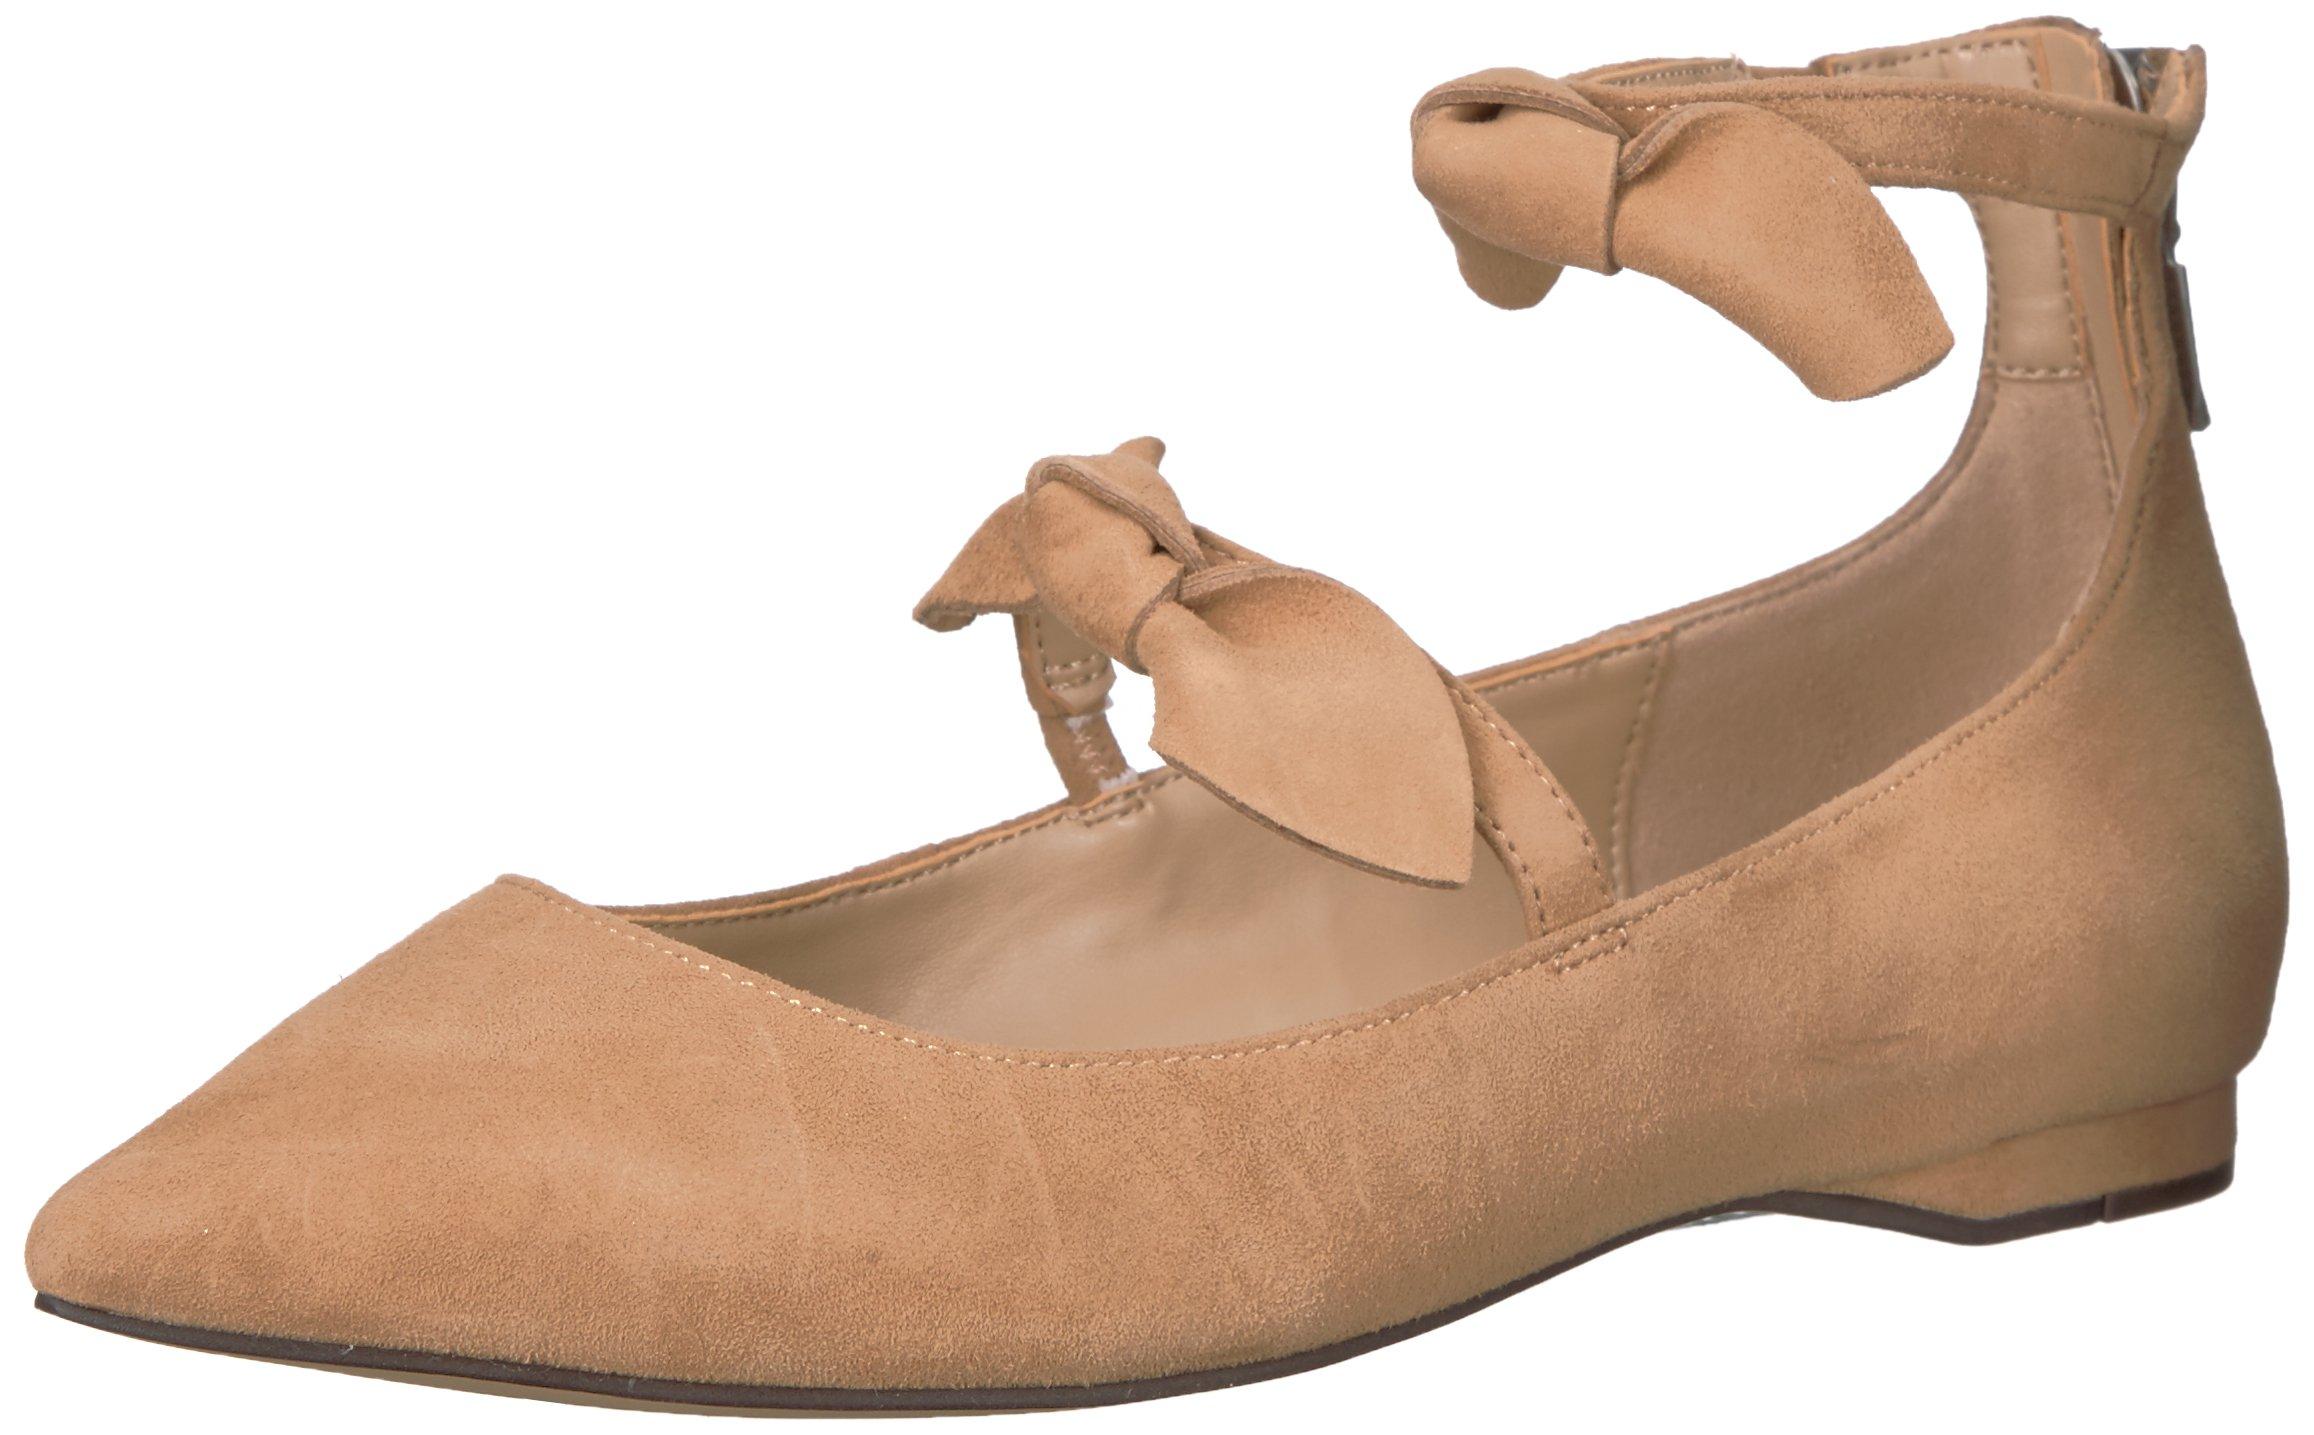 The Fix Women's Emilia Double Bow Pointed-Toe Flat, Camel, 7.5 B US